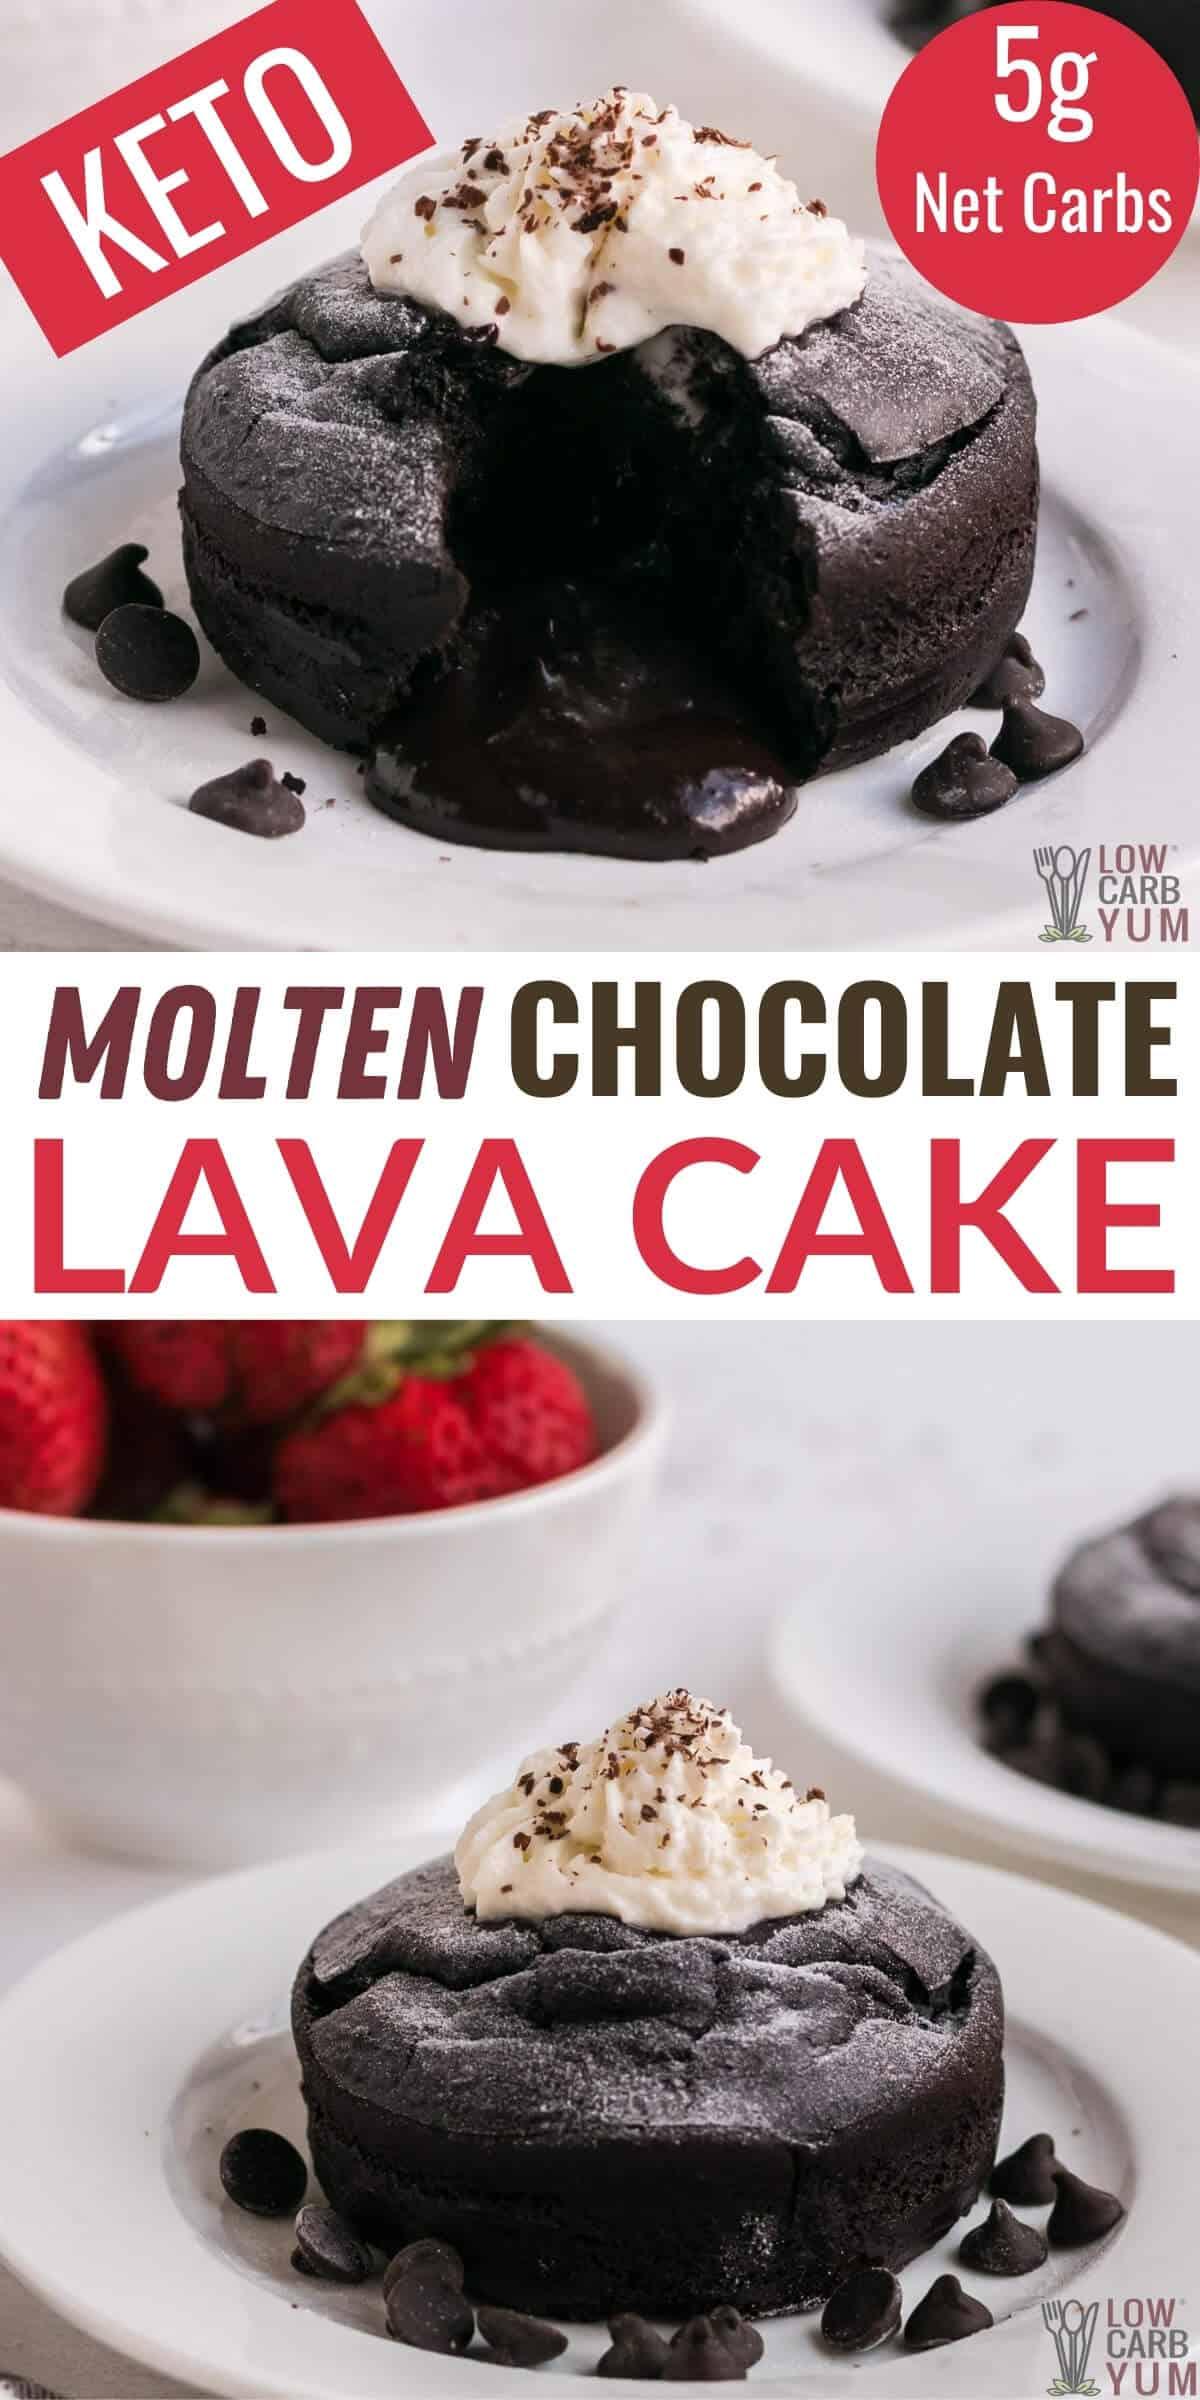 keto molten chocolate lava cake pinterest image